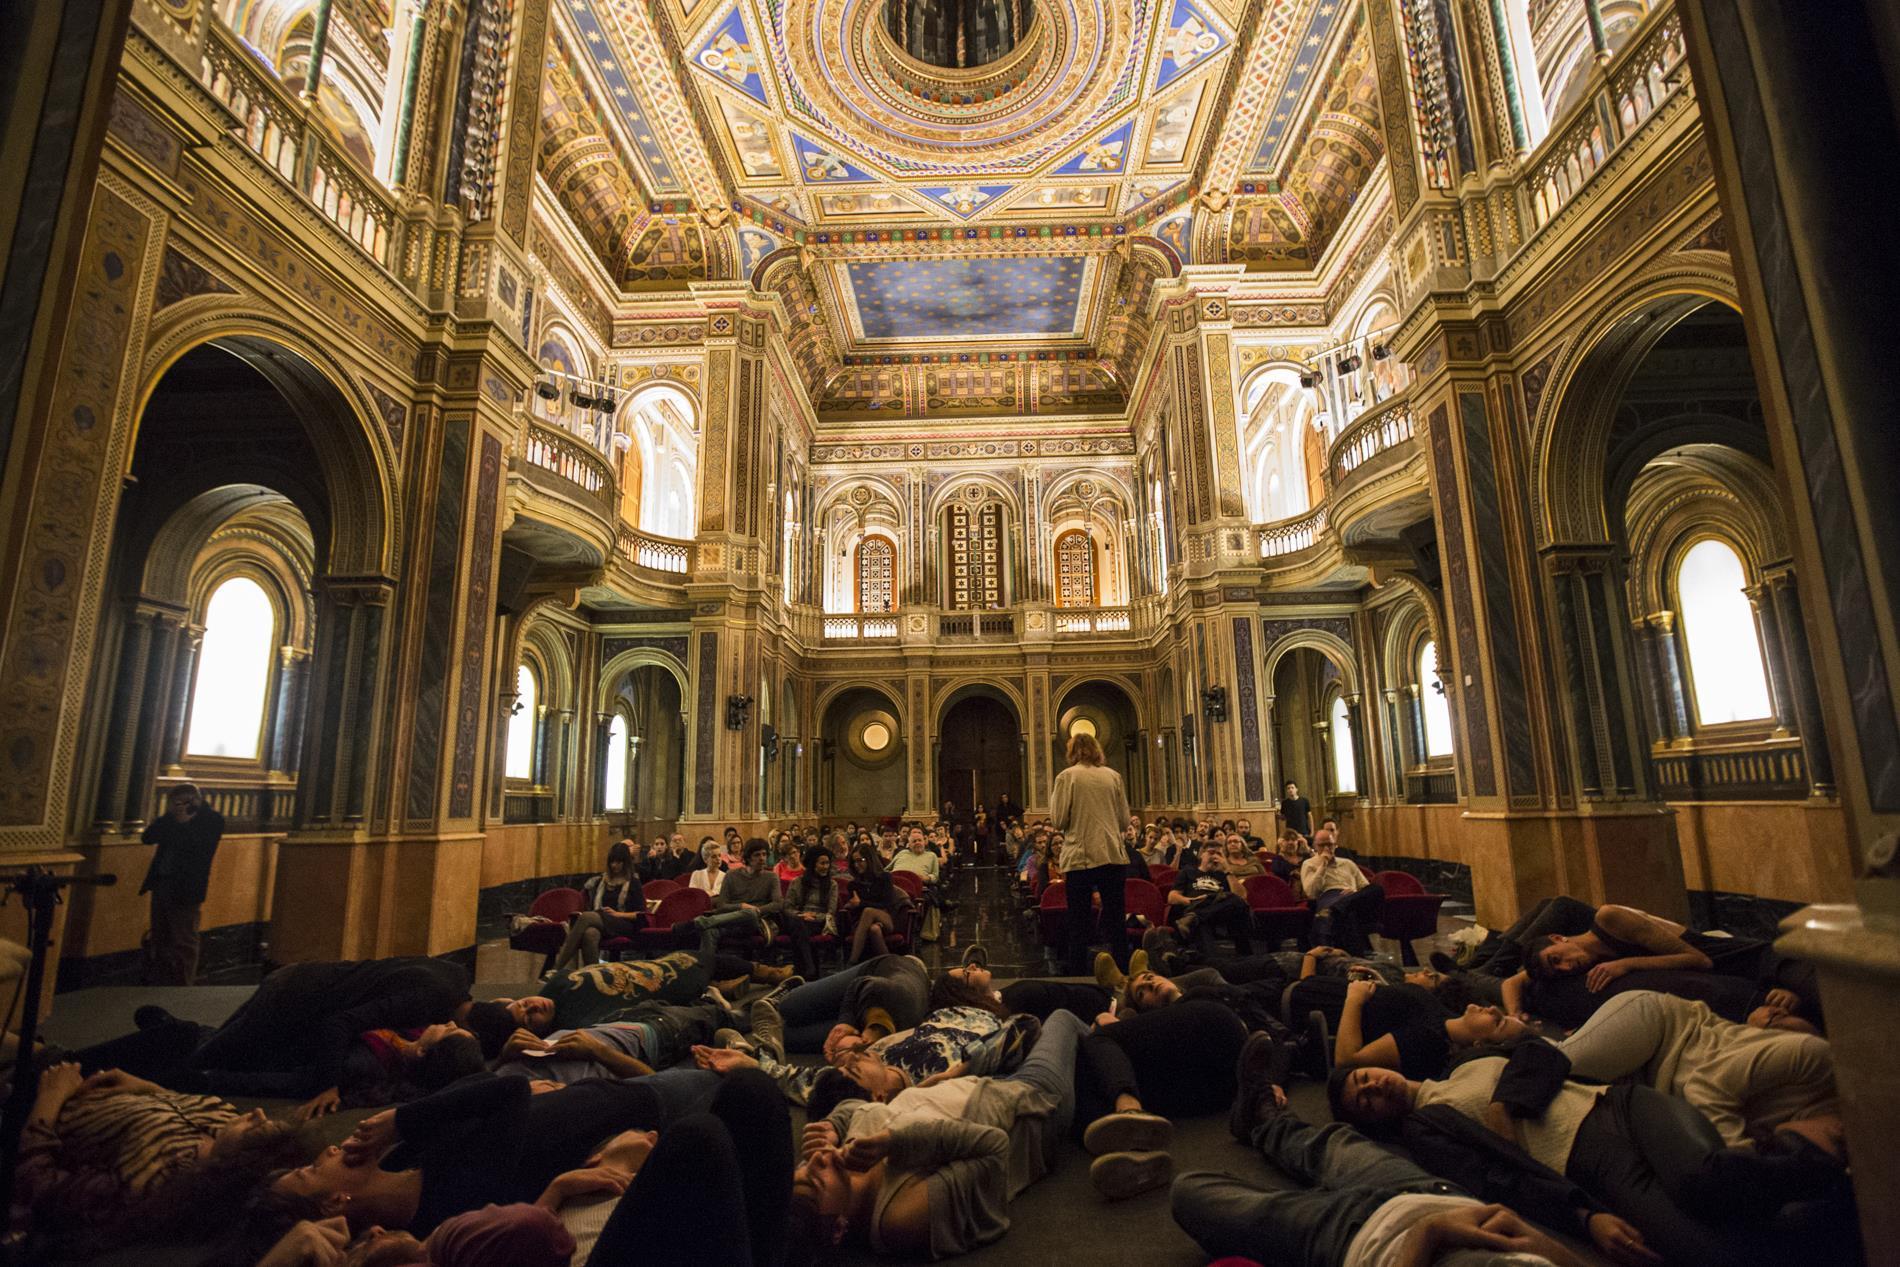 La iglesia neobizantina del Centro Cultural de la Beneficiencia ha alojado 'performances' muy llamativas.